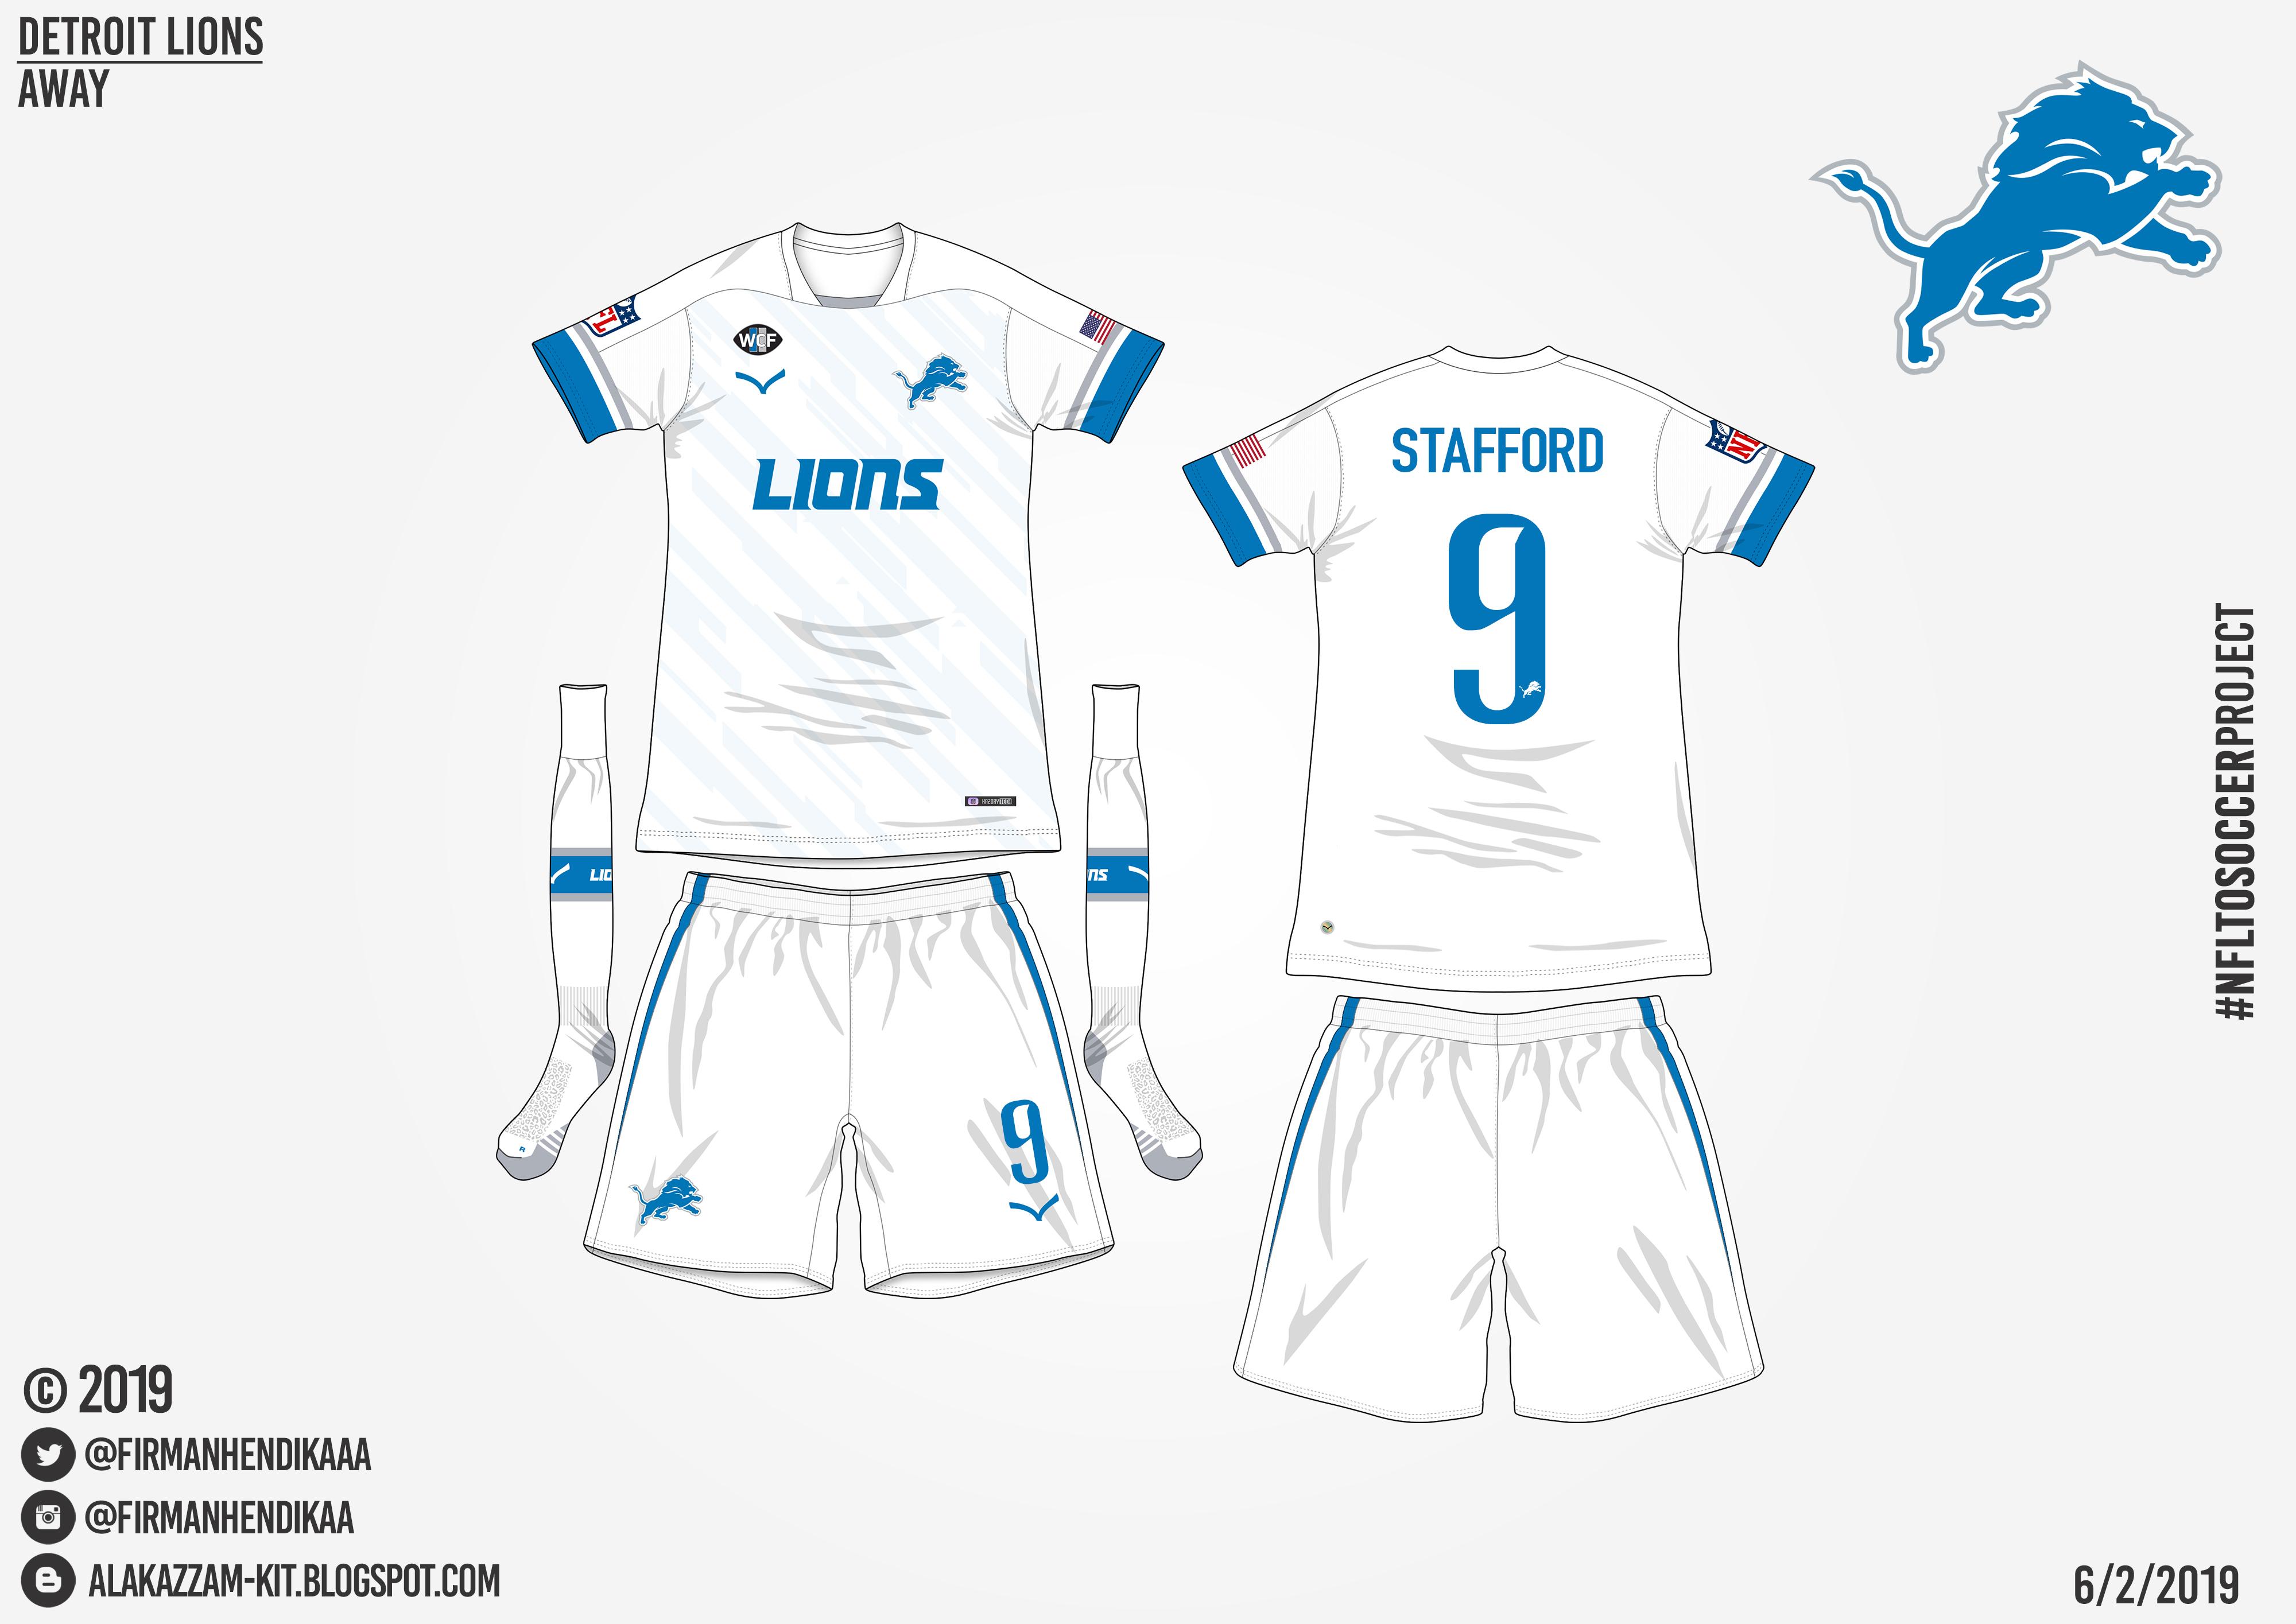 new styles 7acdb a6100 NFLtoSoccerProject - Detroit Lions (Away)